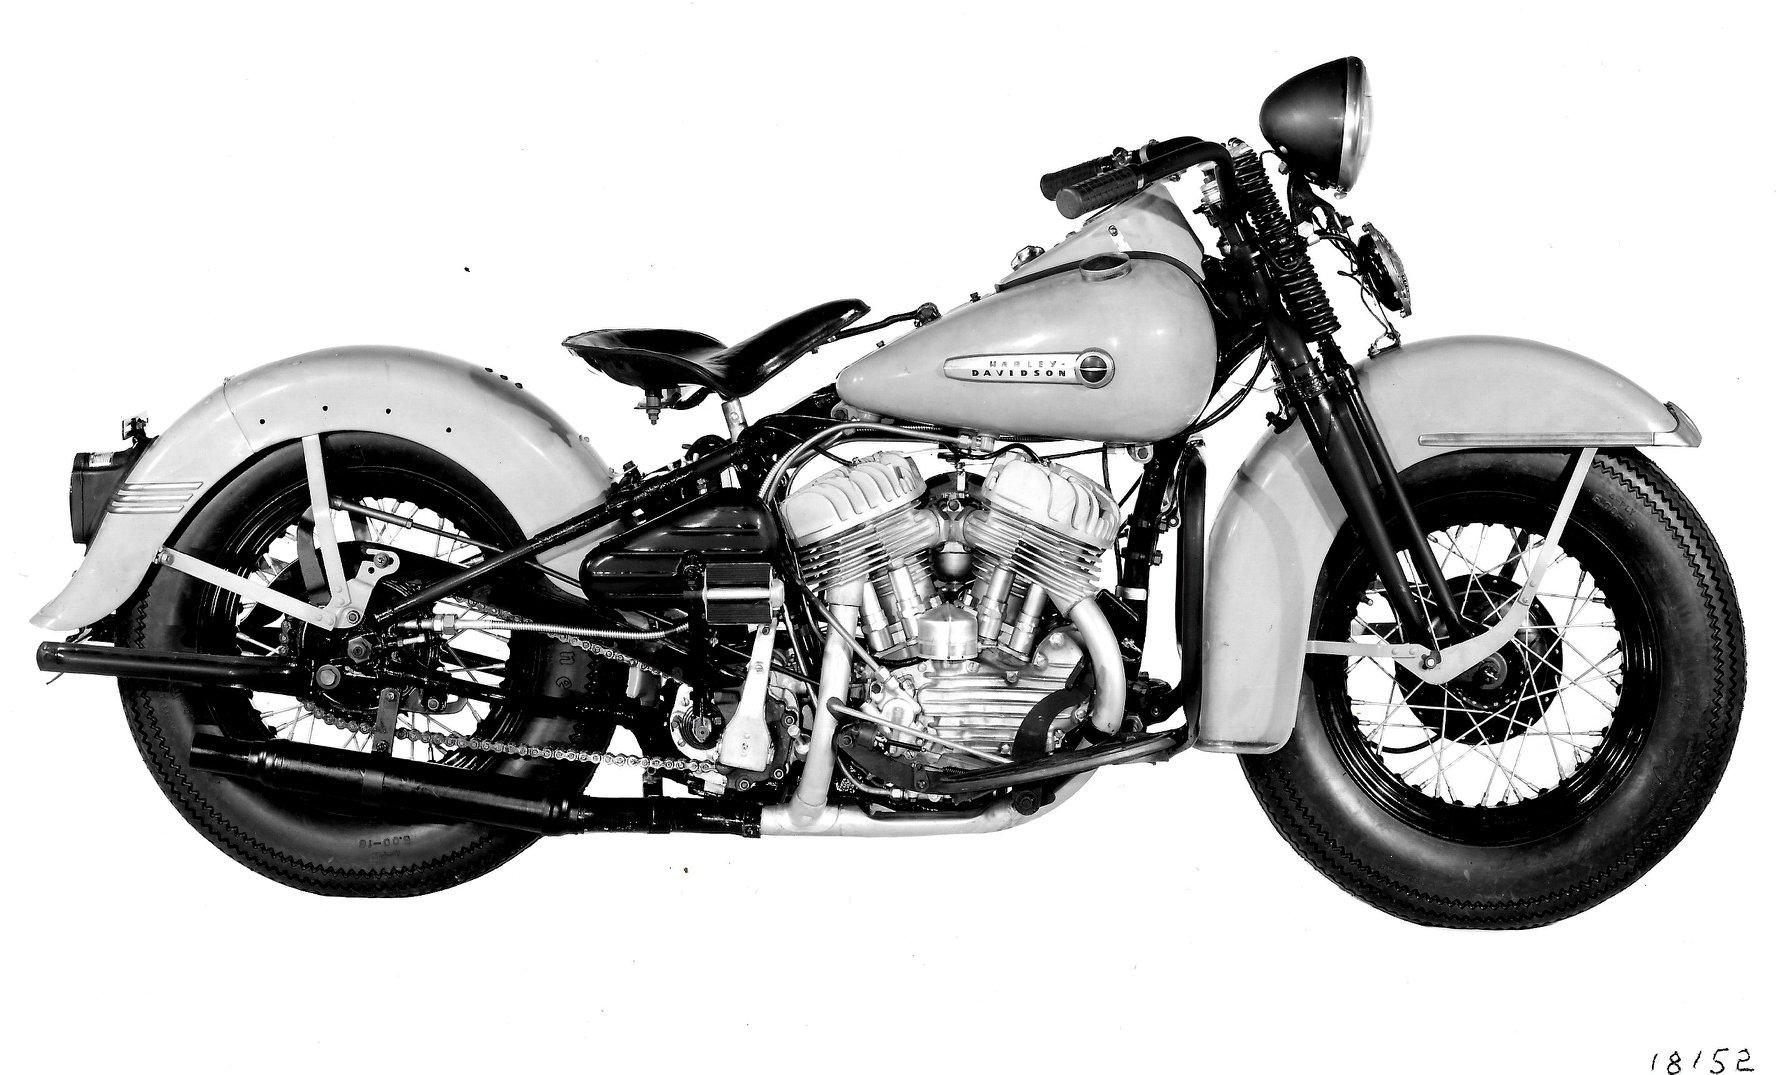 Modelo WL-45 de 1950